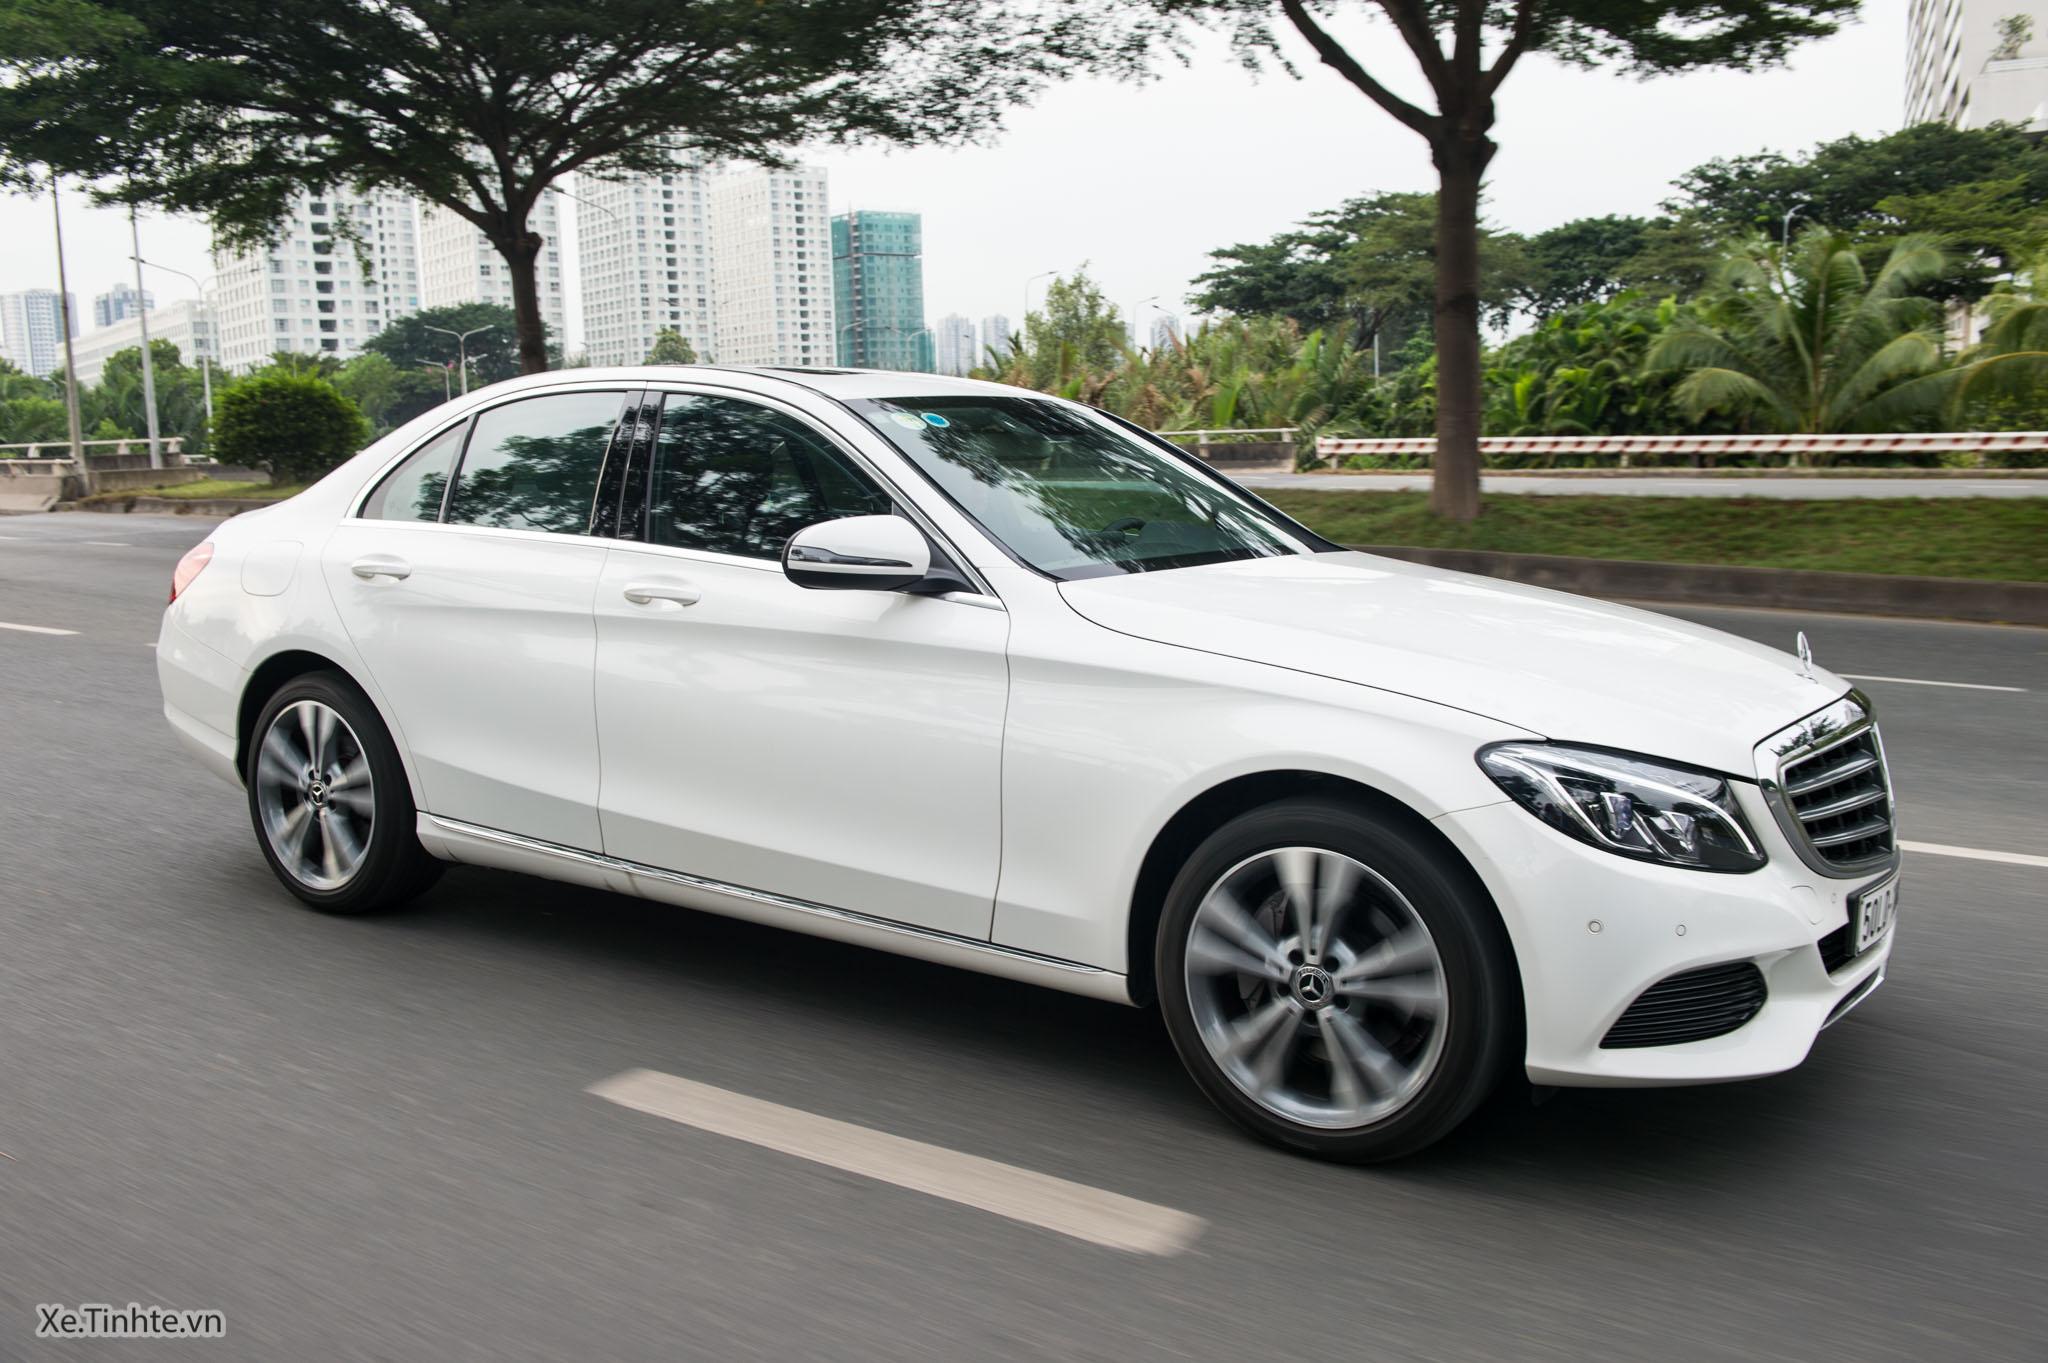 Mercedes_C250 Exclusive_Xe.tinhte.vn-7426.jpg